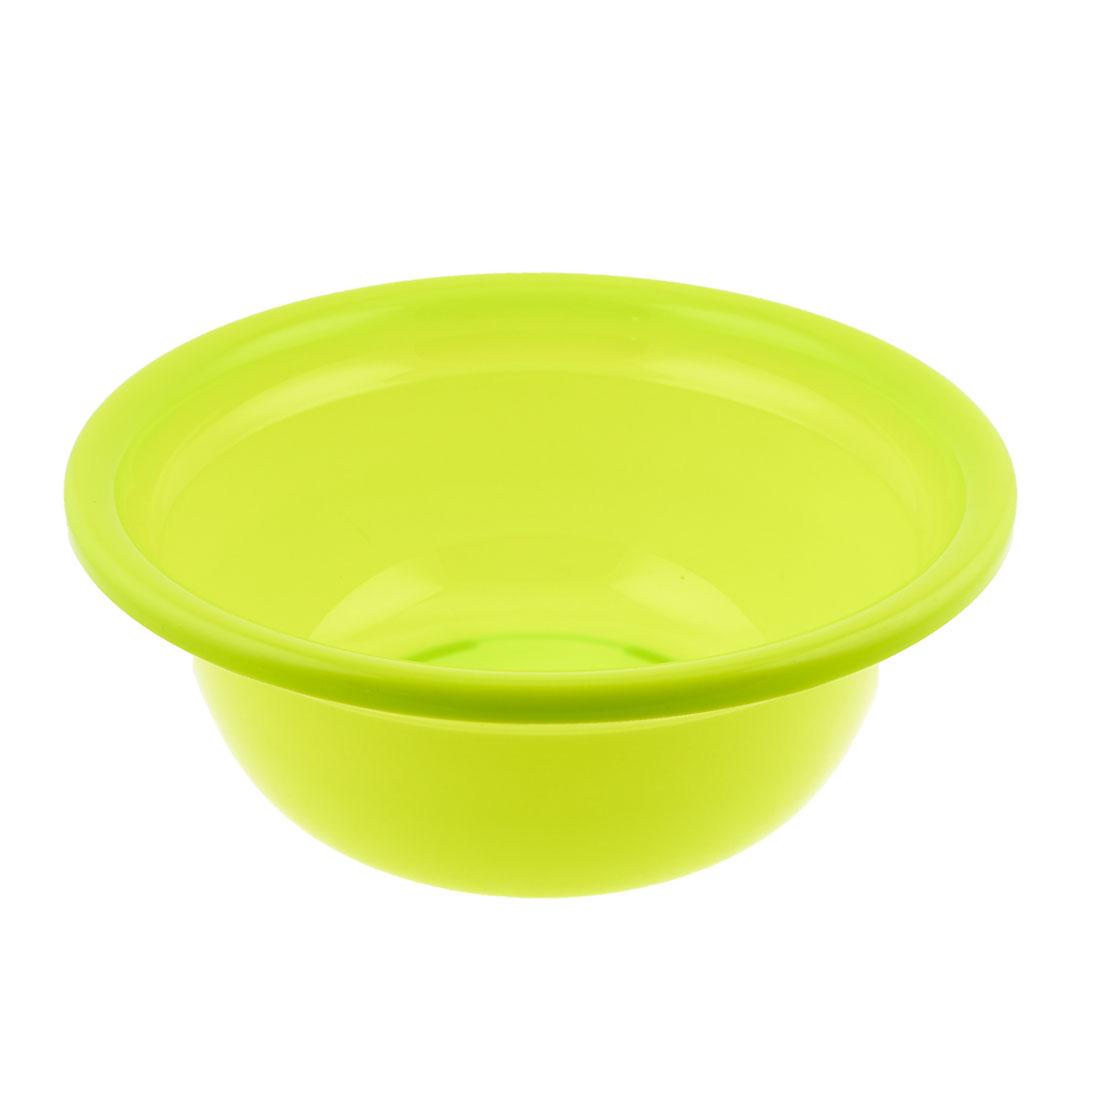 "Family Kitchen Yellow Green Round Plastic Anti Slip Washing up Bowl 12.2"" Dia"